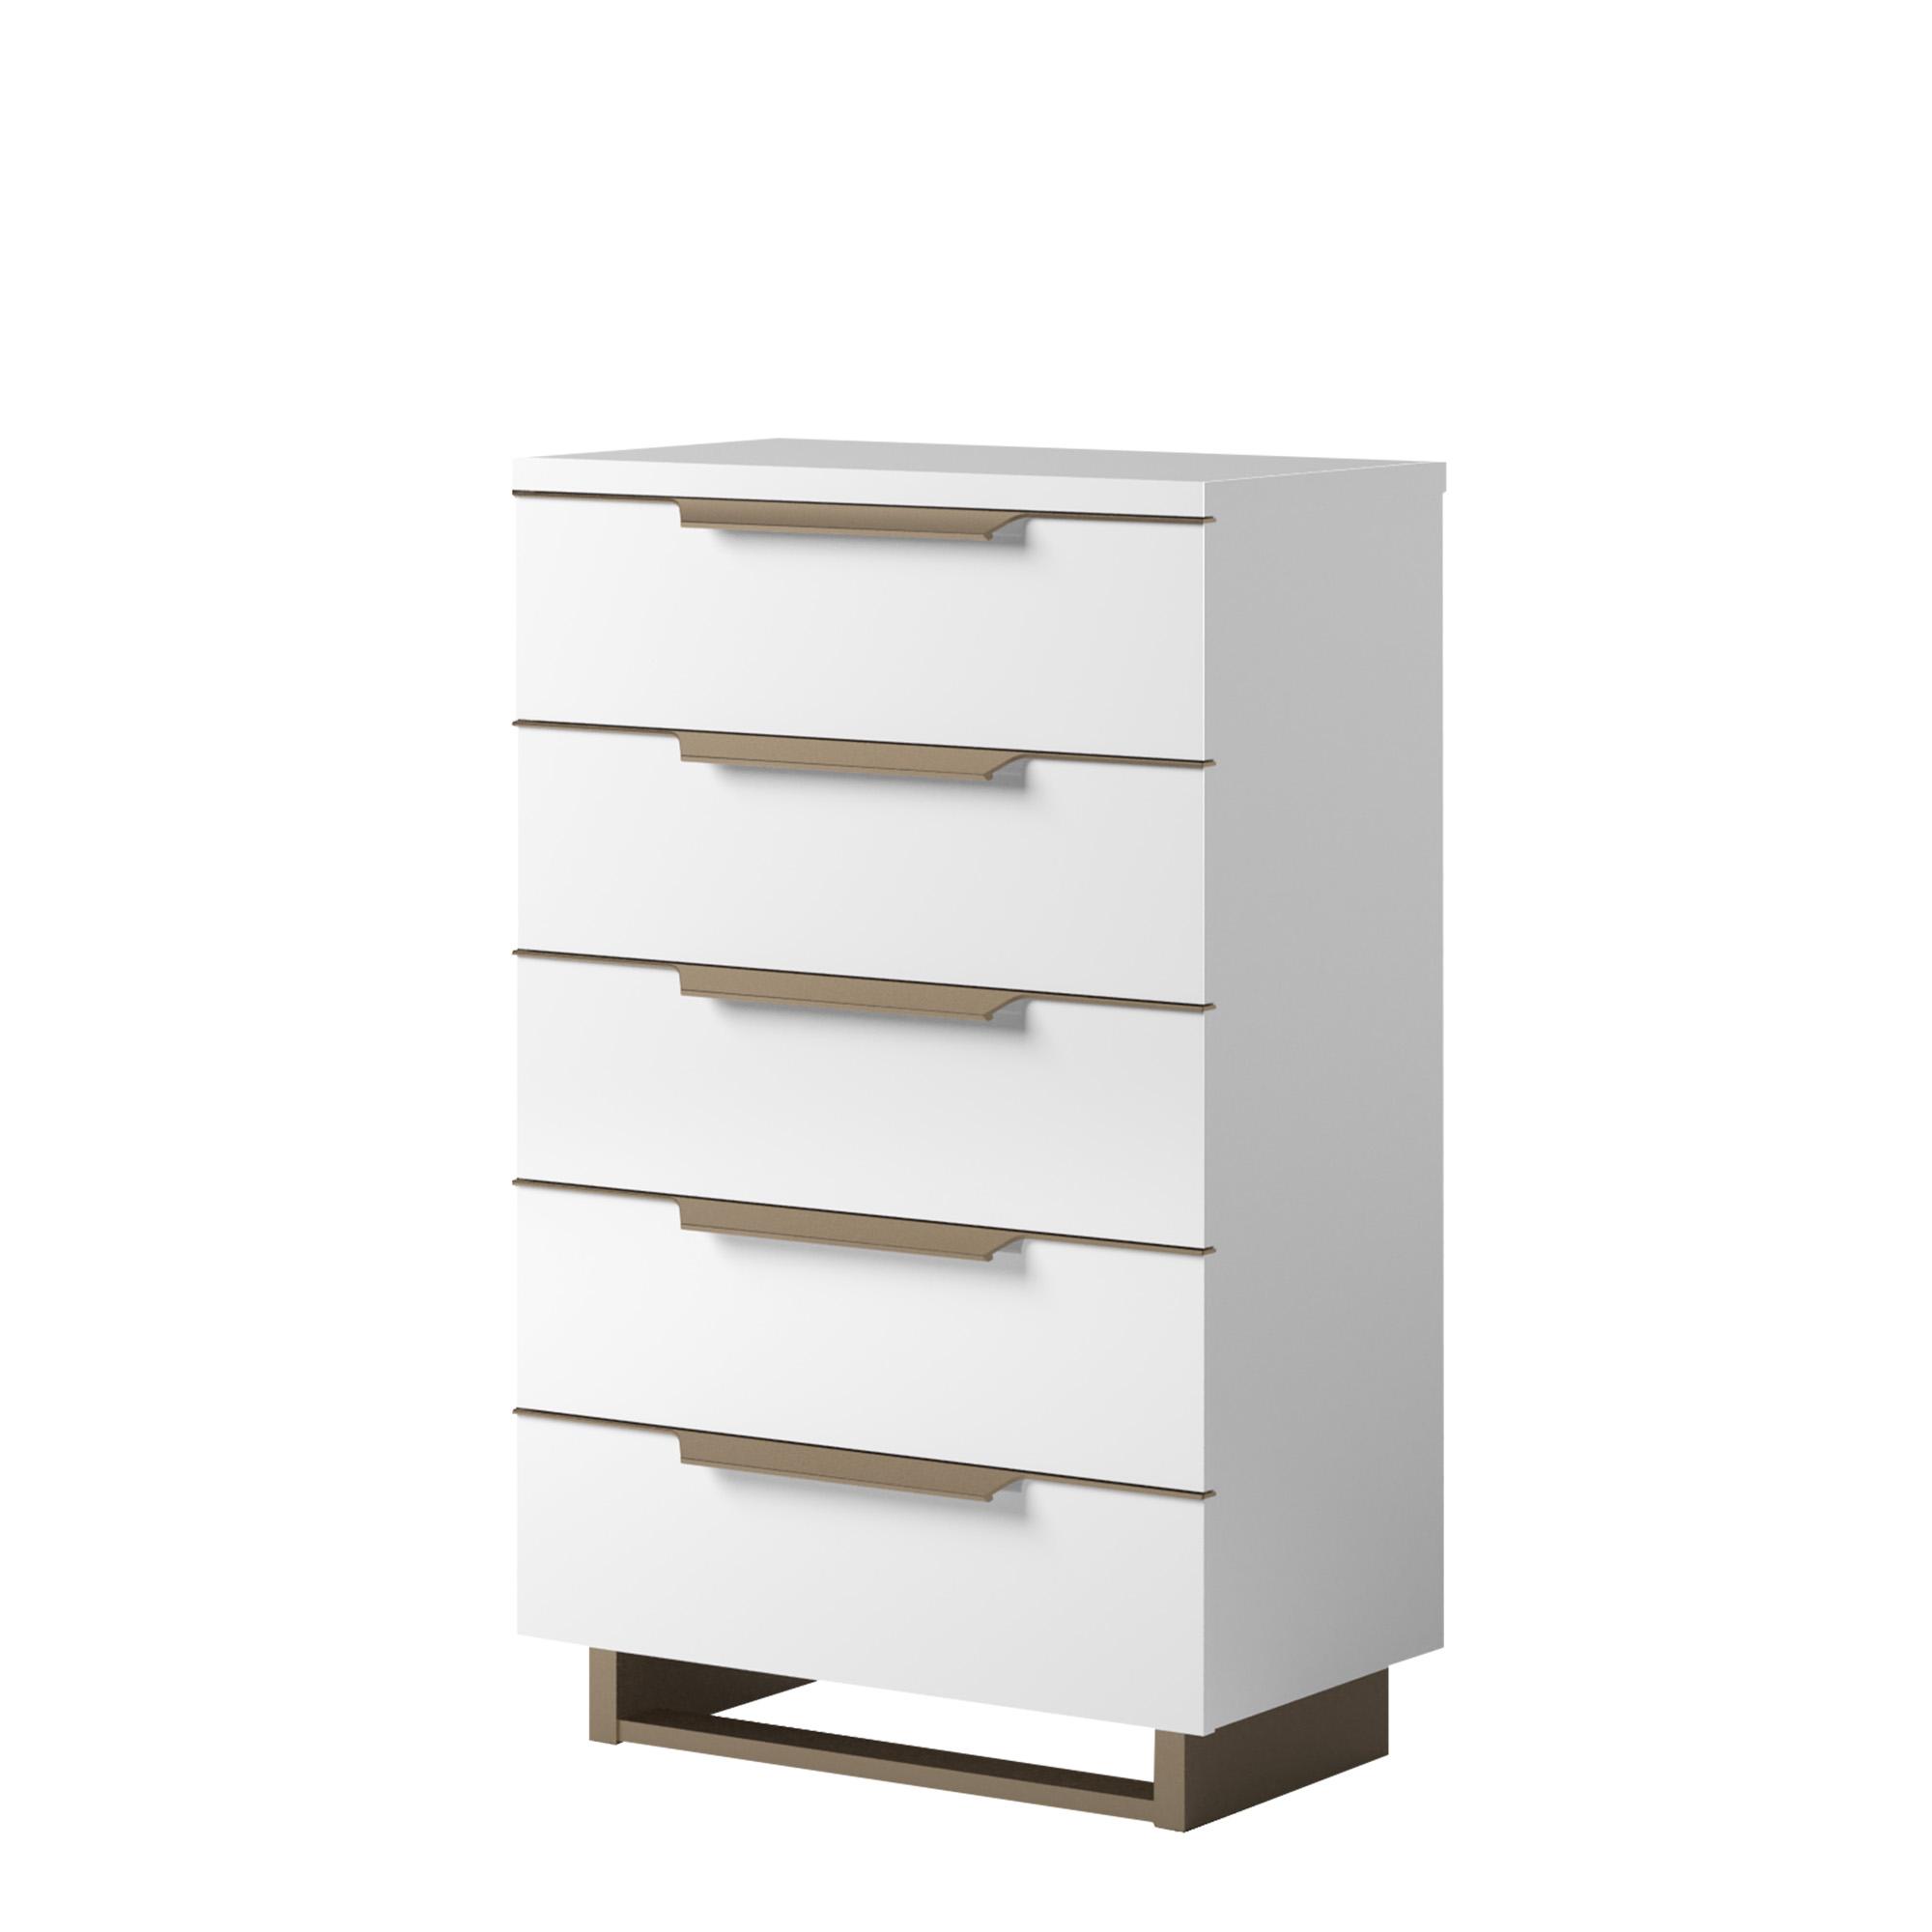 sahara tall boy 6 drawer chest in white gloss finish